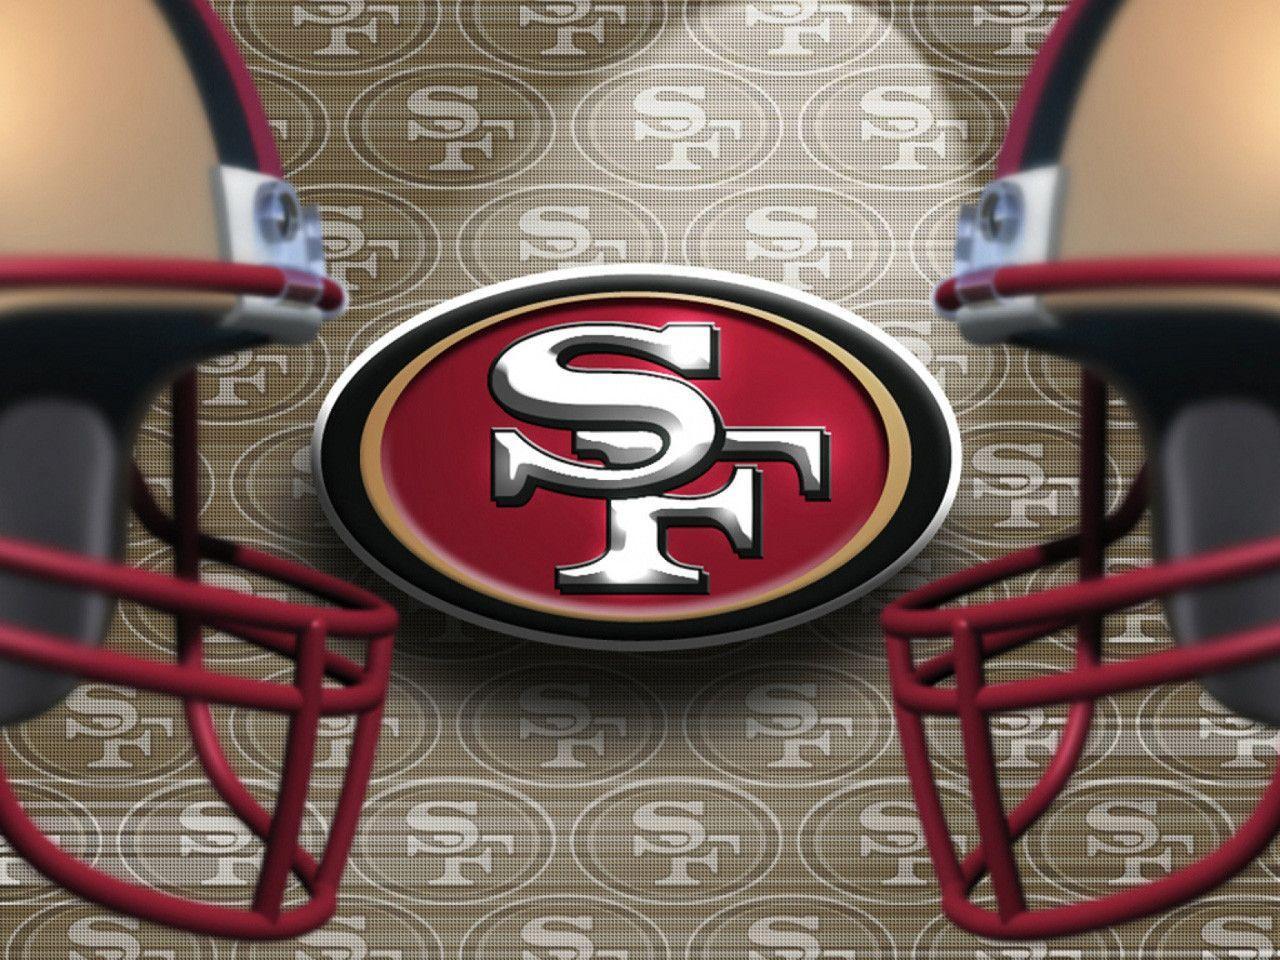 San Francisco 49ers HD Wallpapers 2017 - American Football